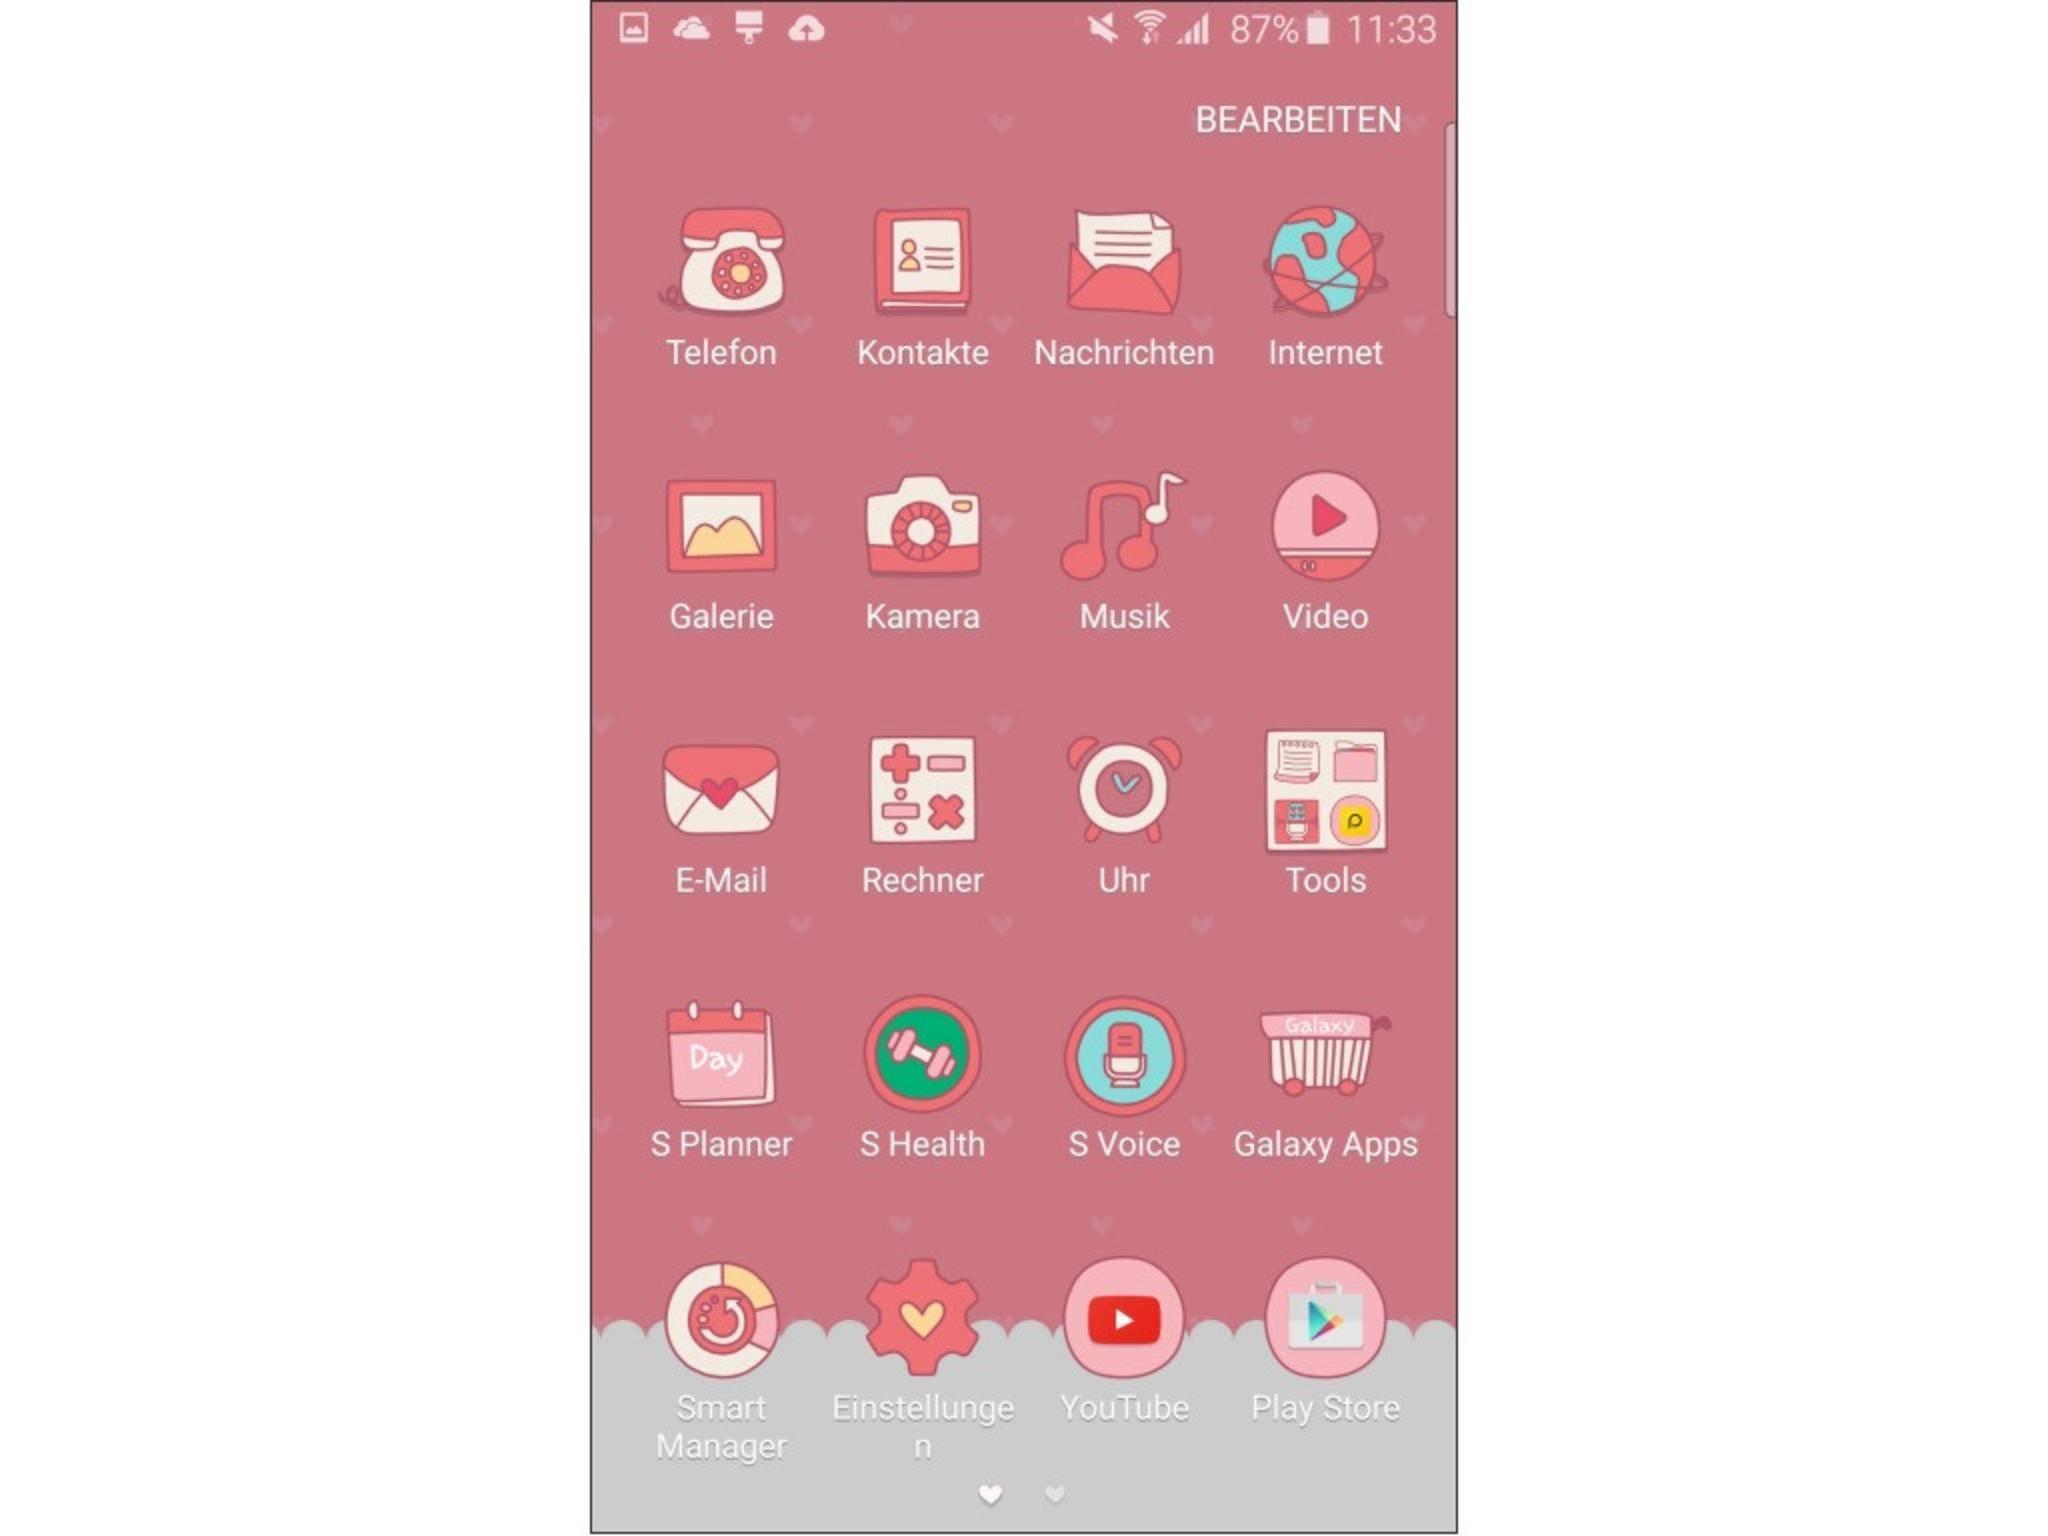 Galaxy S6 Screenshot 3